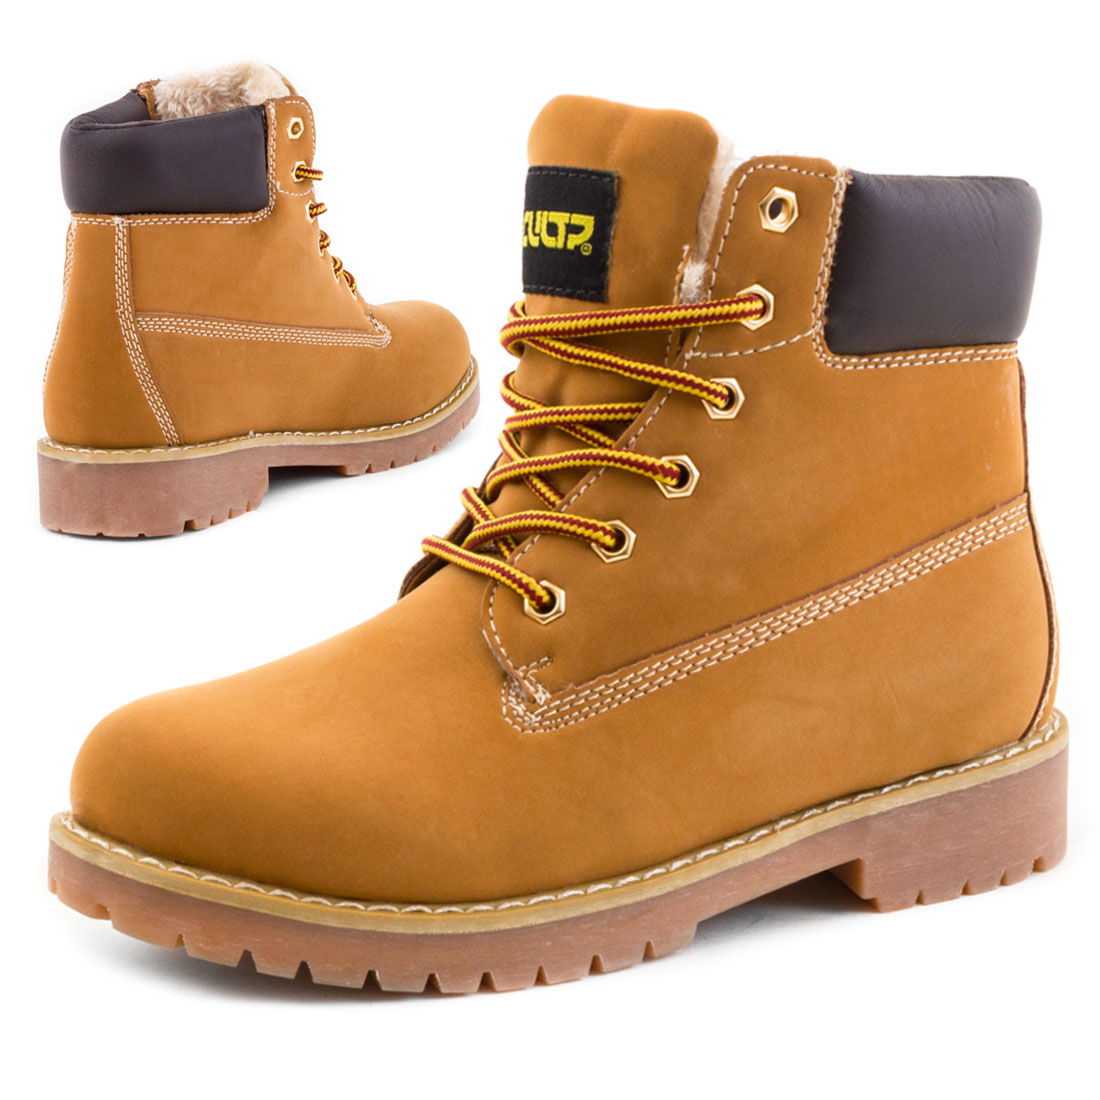 neu damen herren boots sneaker schuhe gr 36 37 38 39 40 41. Black Bedroom Furniture Sets. Home Design Ideas